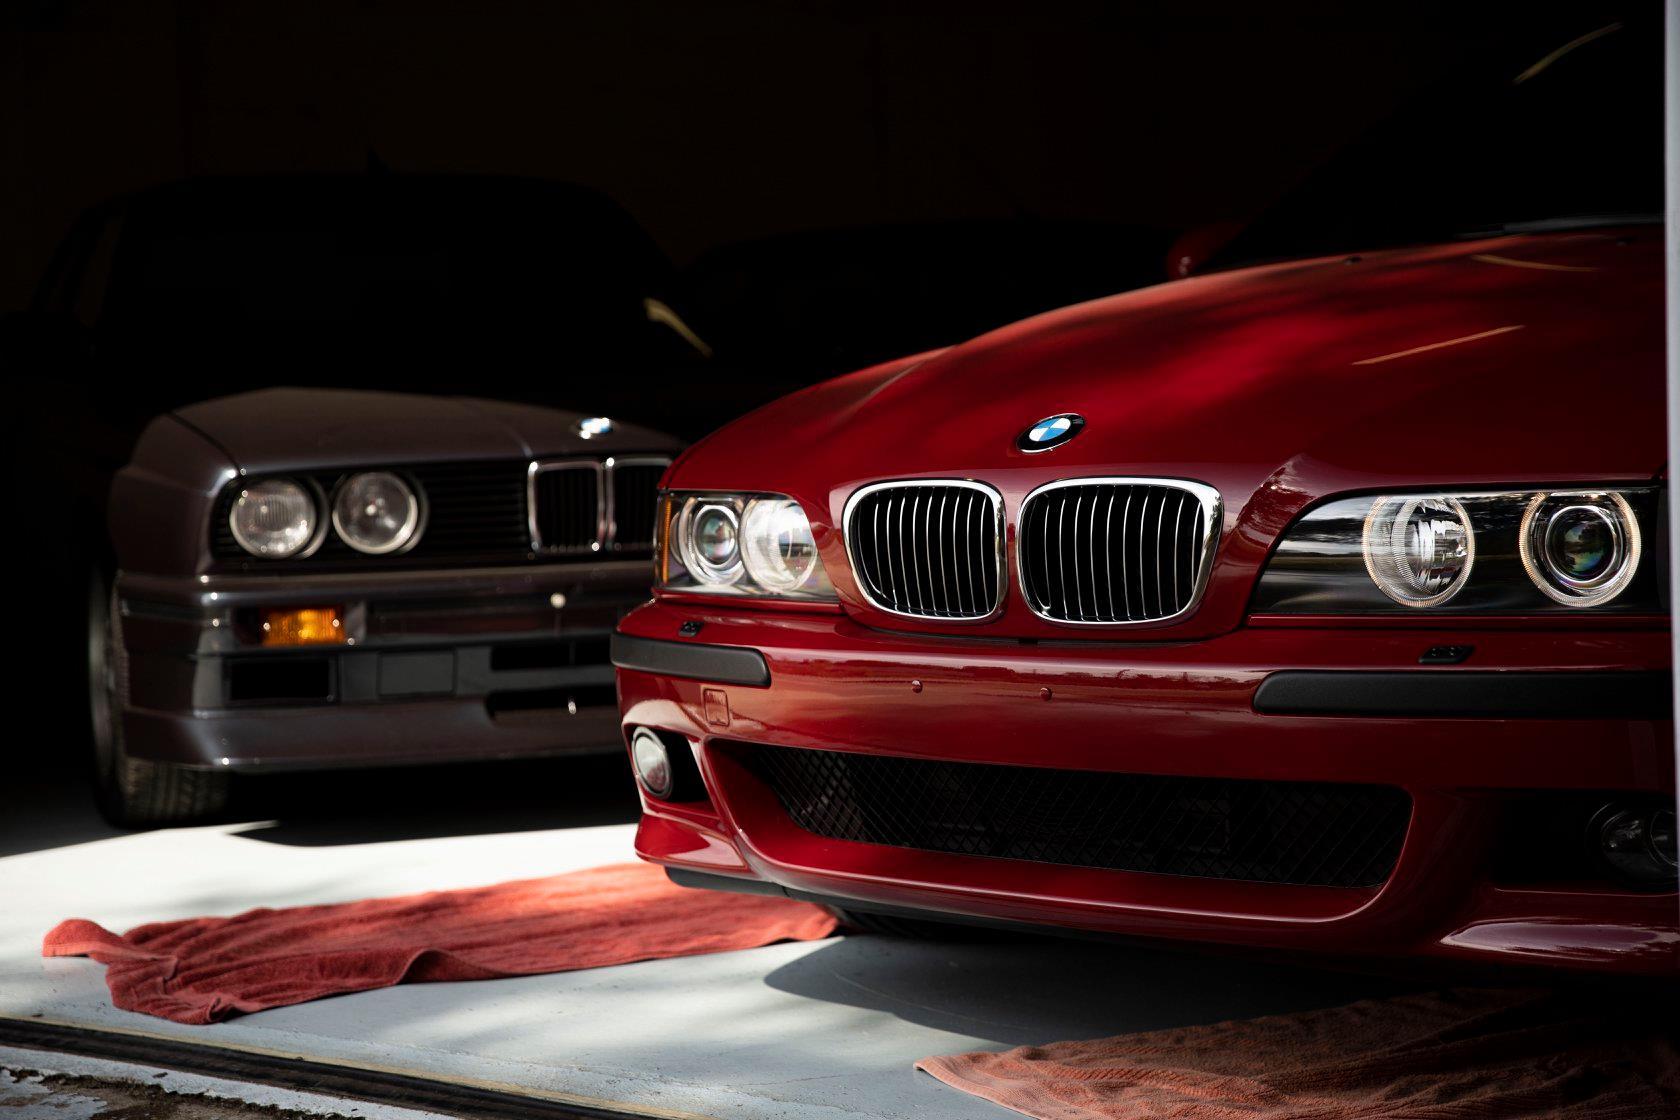 BMW_M5_E39_Imola_Red_0004